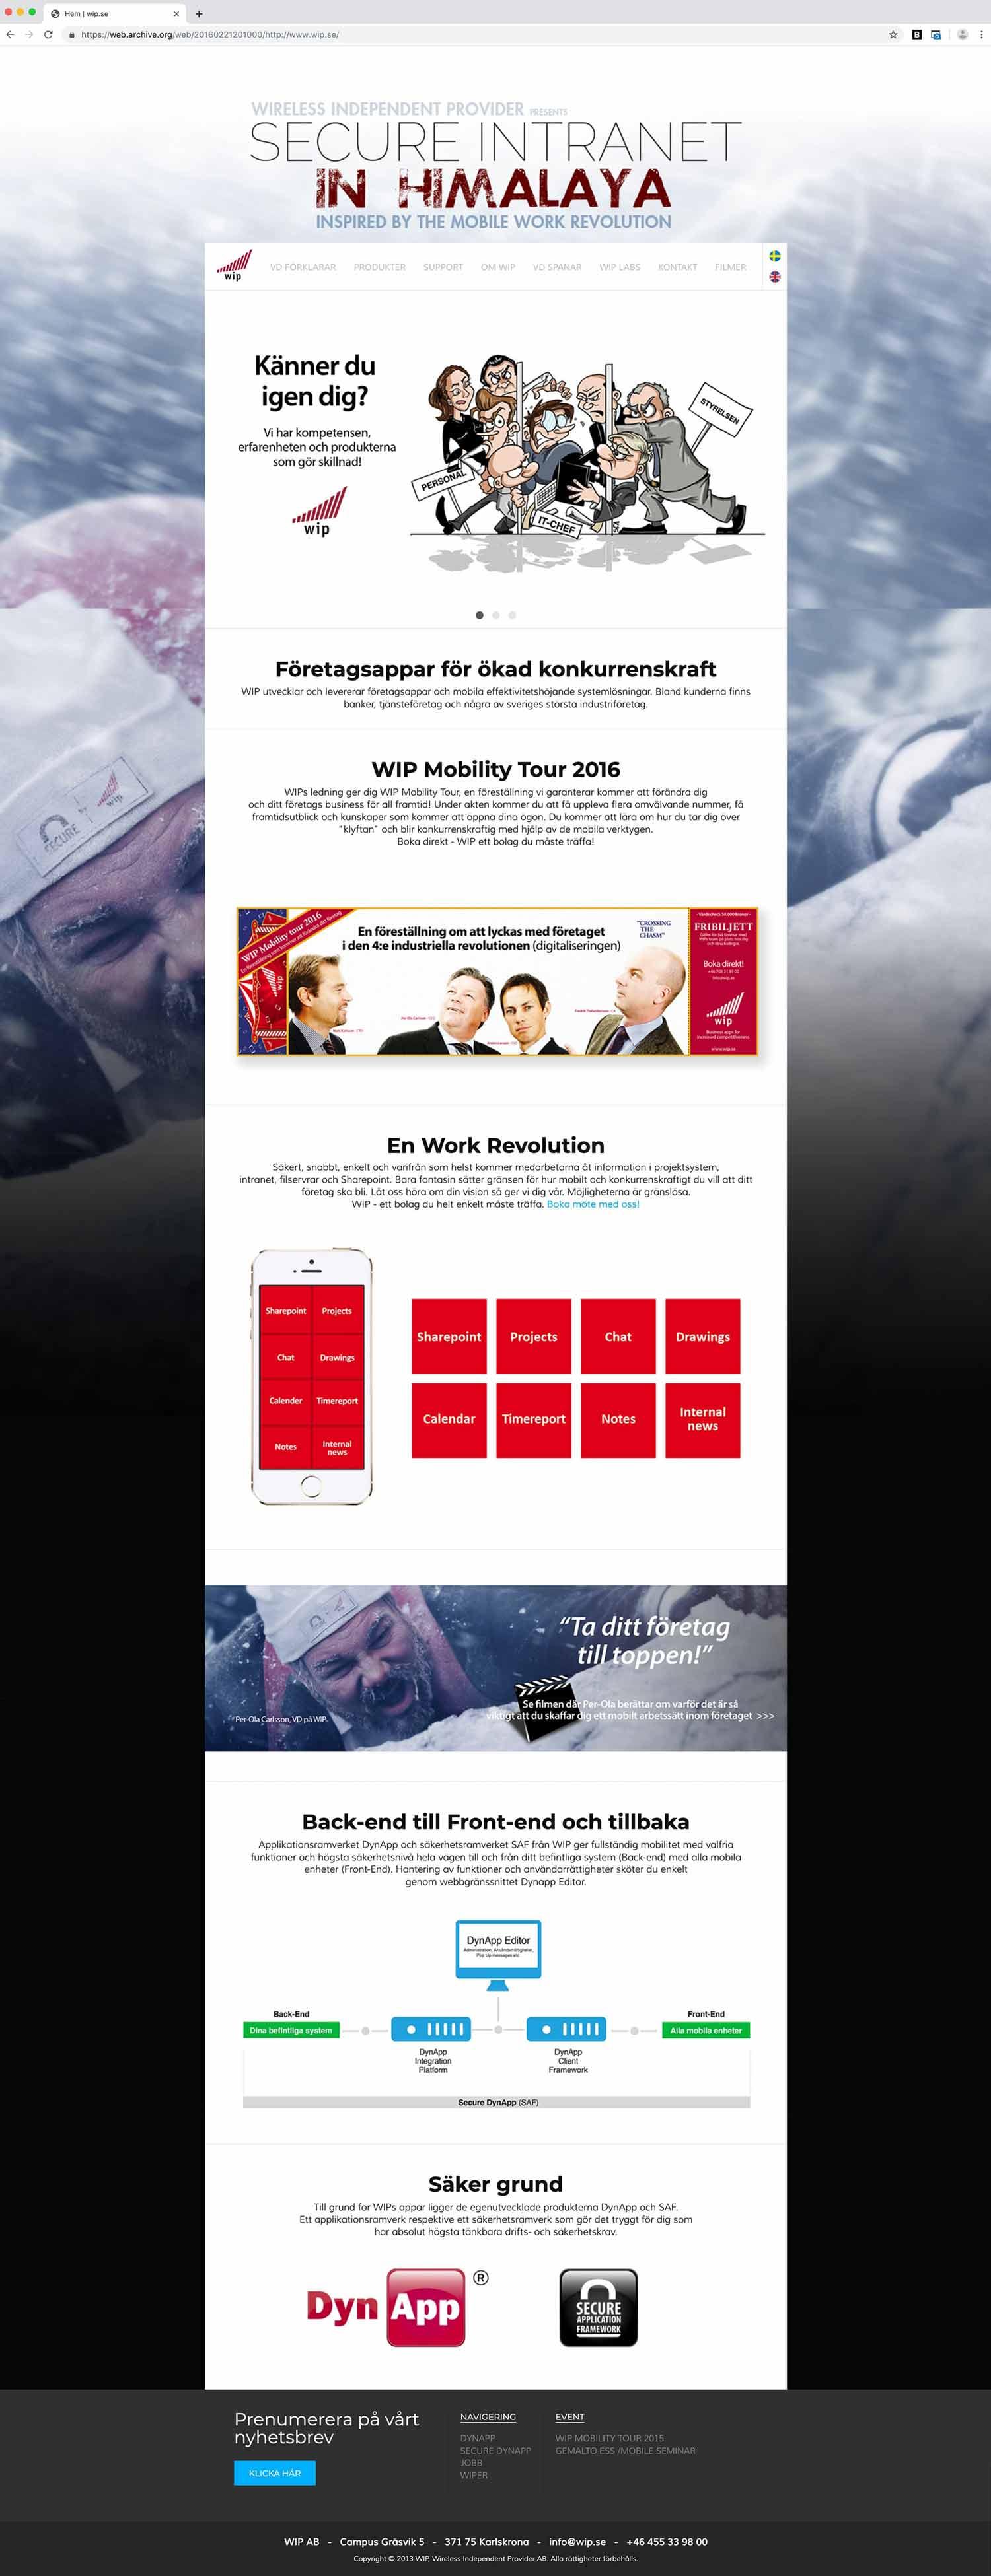 WIP's old website